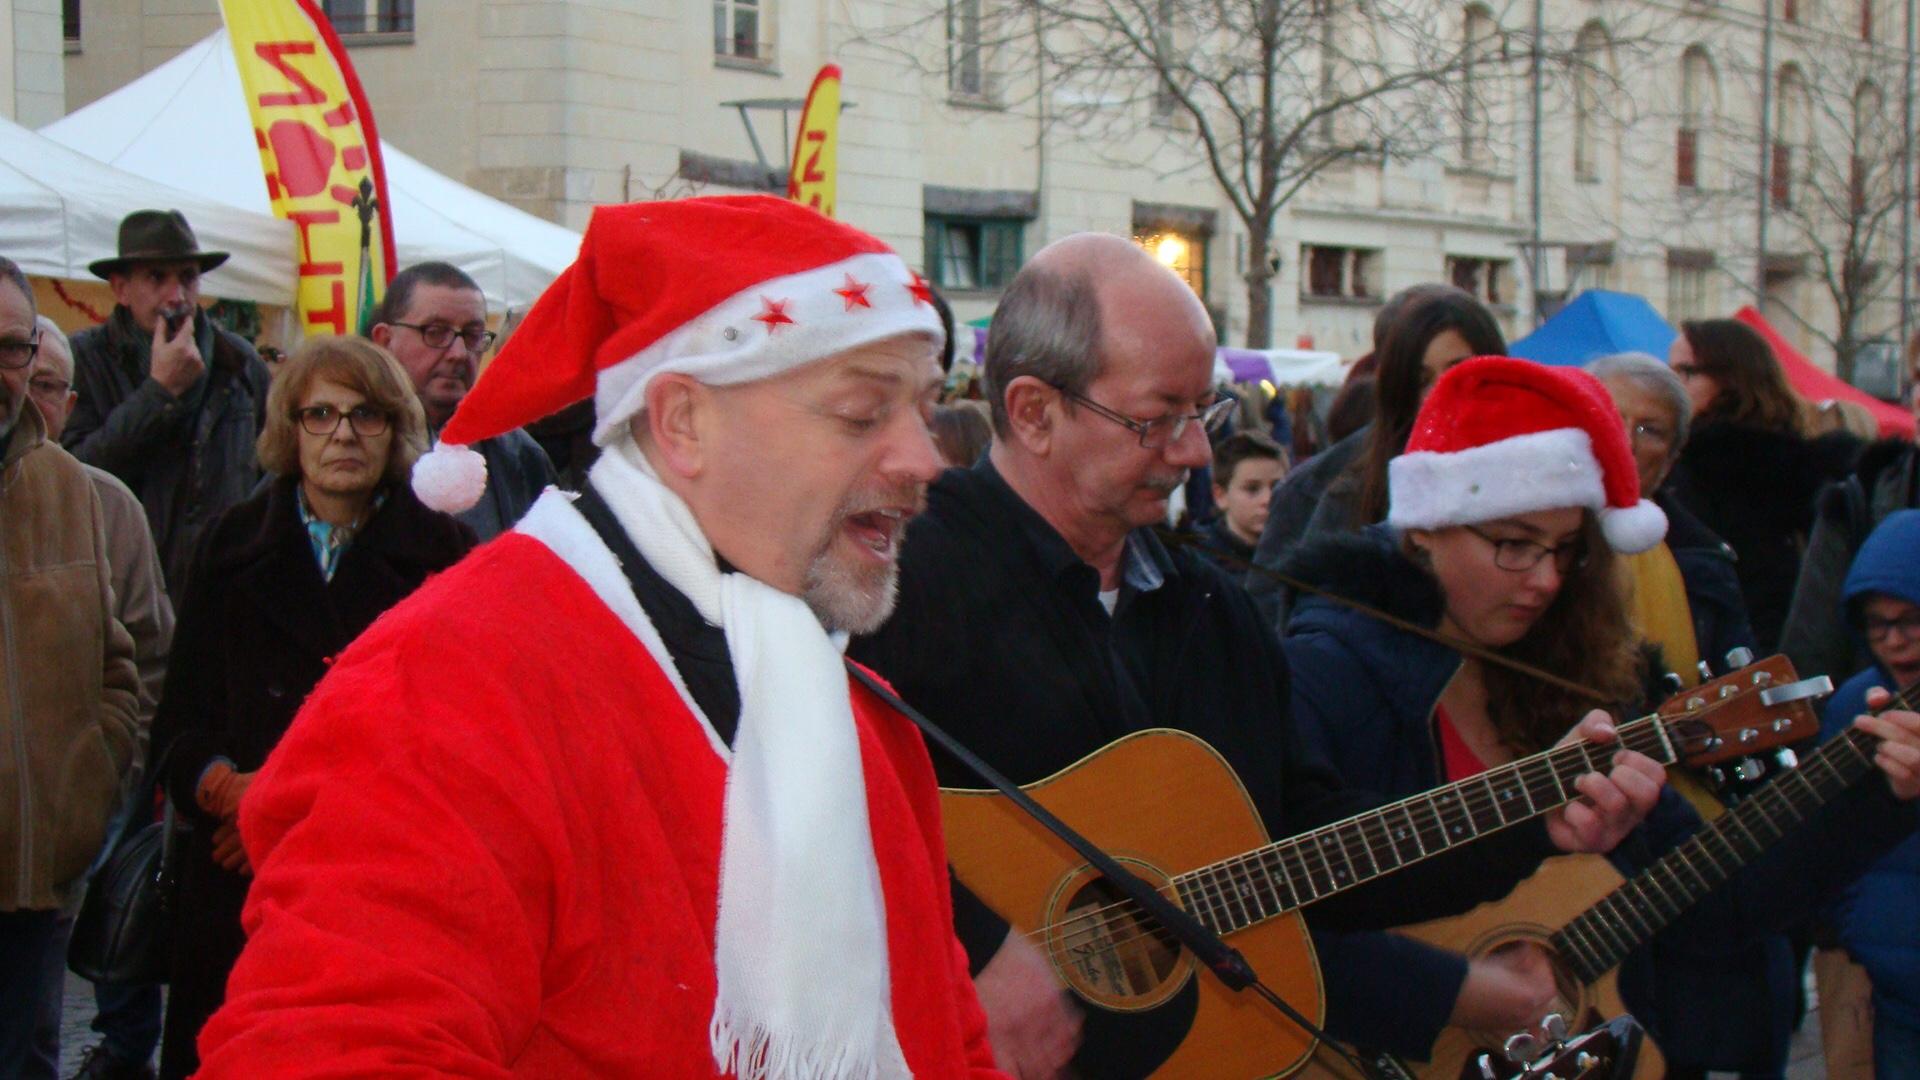 2015-12-12 – Au marché de Noël (16) Anita